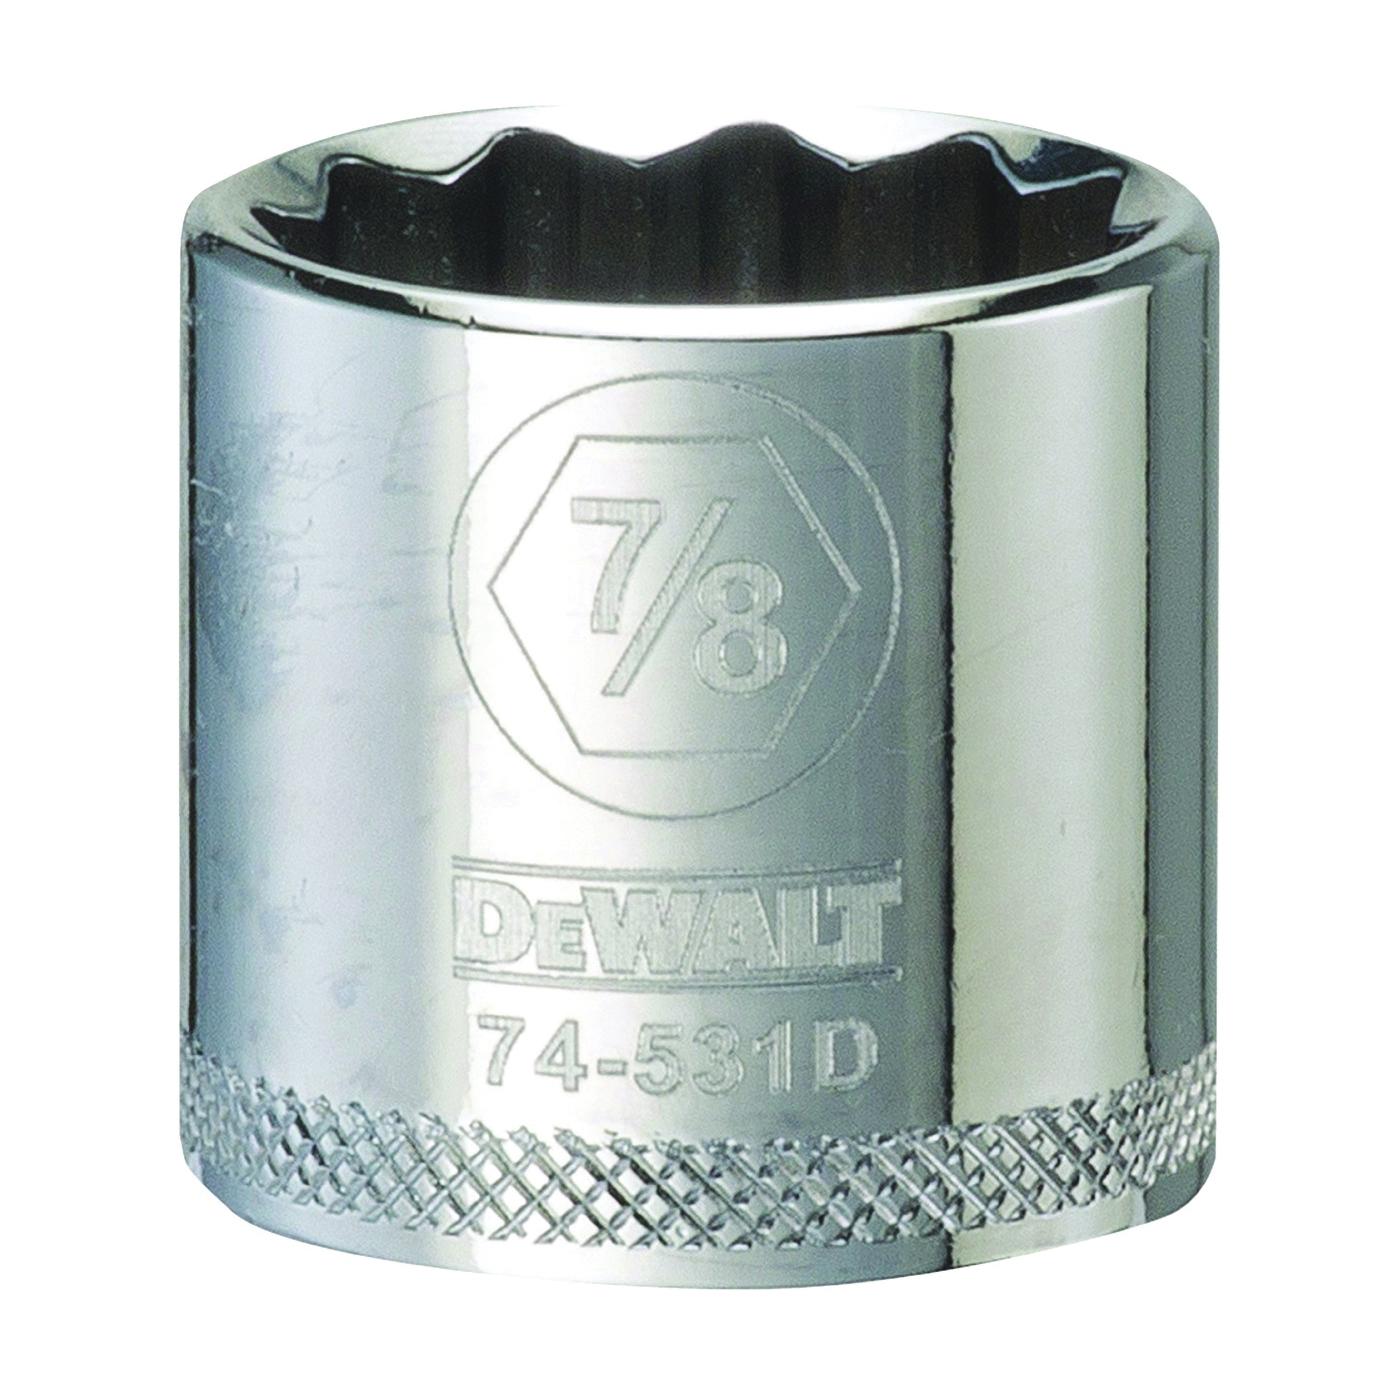 Picture of DeWALT DWMT74531OSP Hand Socket, 7/8 in Socket, 3/8 in Drive, 12 -Point, Vanadium Steel, Polished Chrome